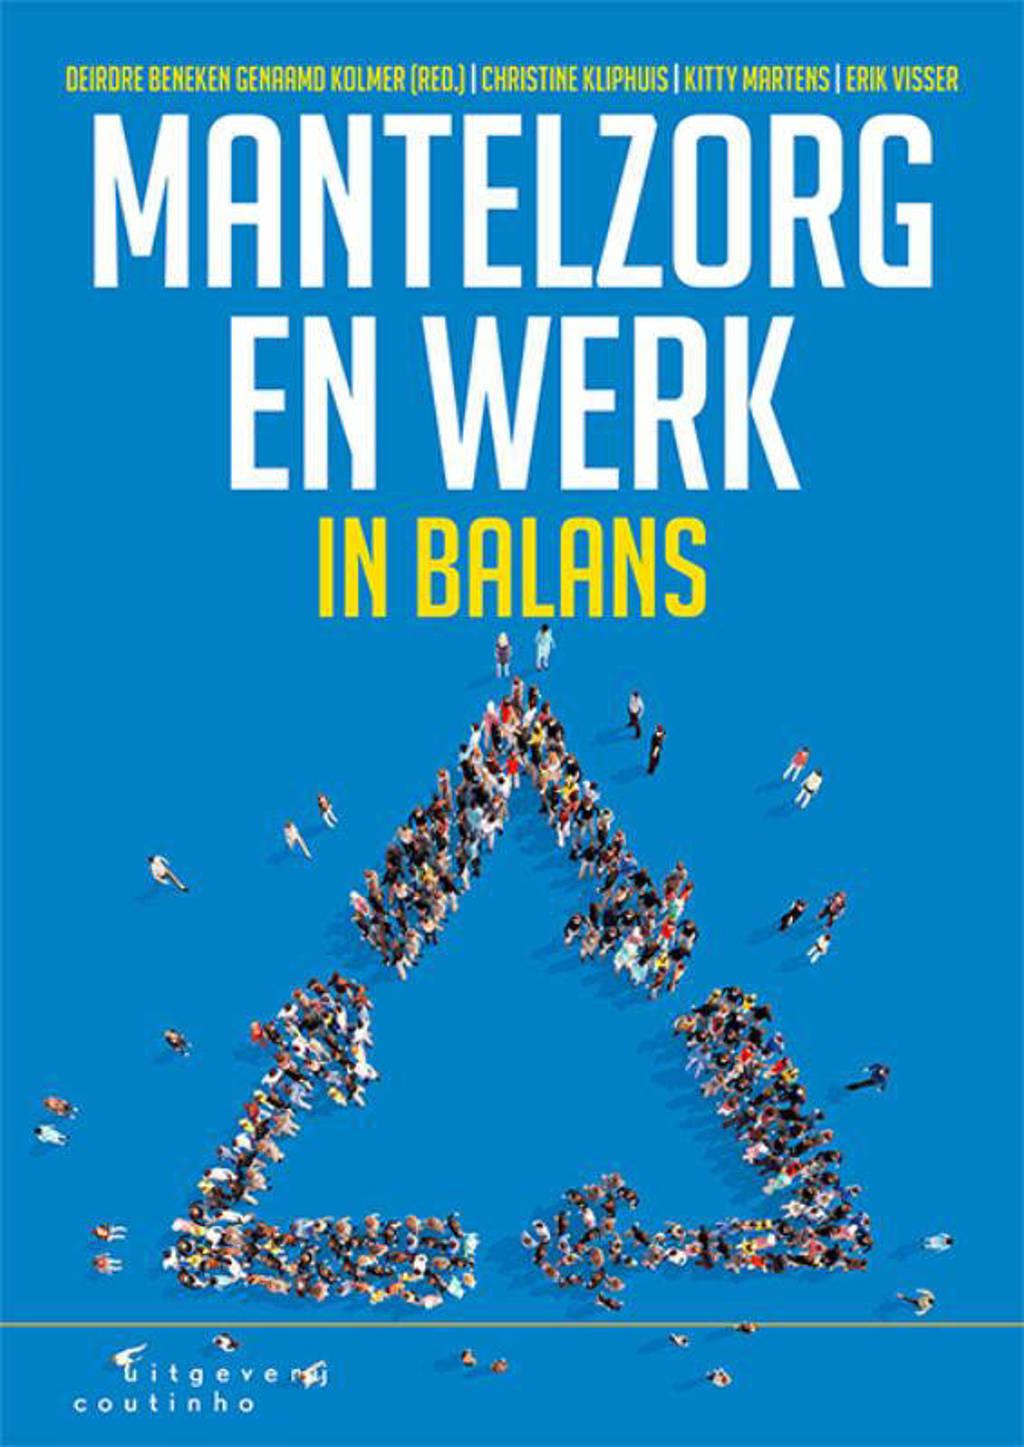 Mantelzorg en werk in balans - Deirdre Beneken, Christine Kliphuis, Kitty Martens, e.a.